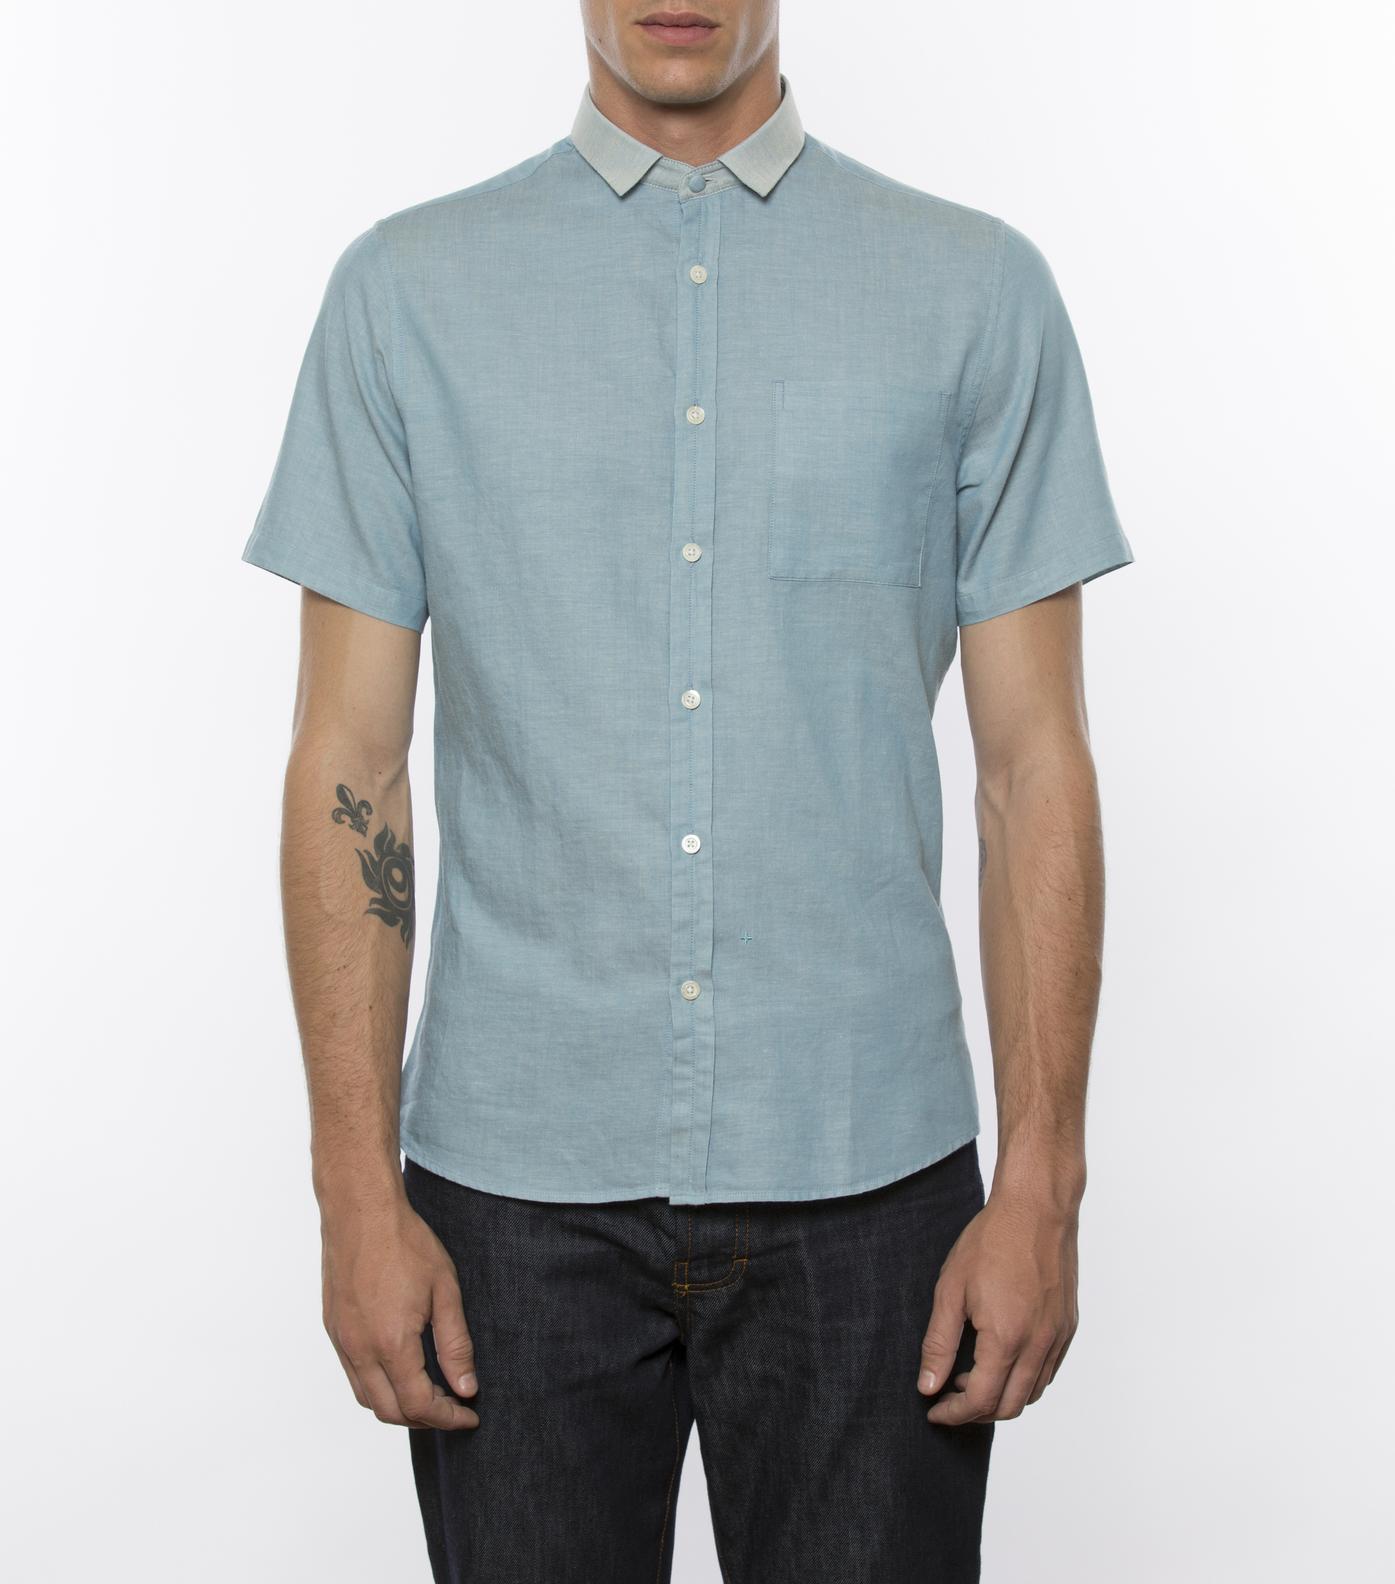 Shirt Dimitrieff 02 - Turquoise